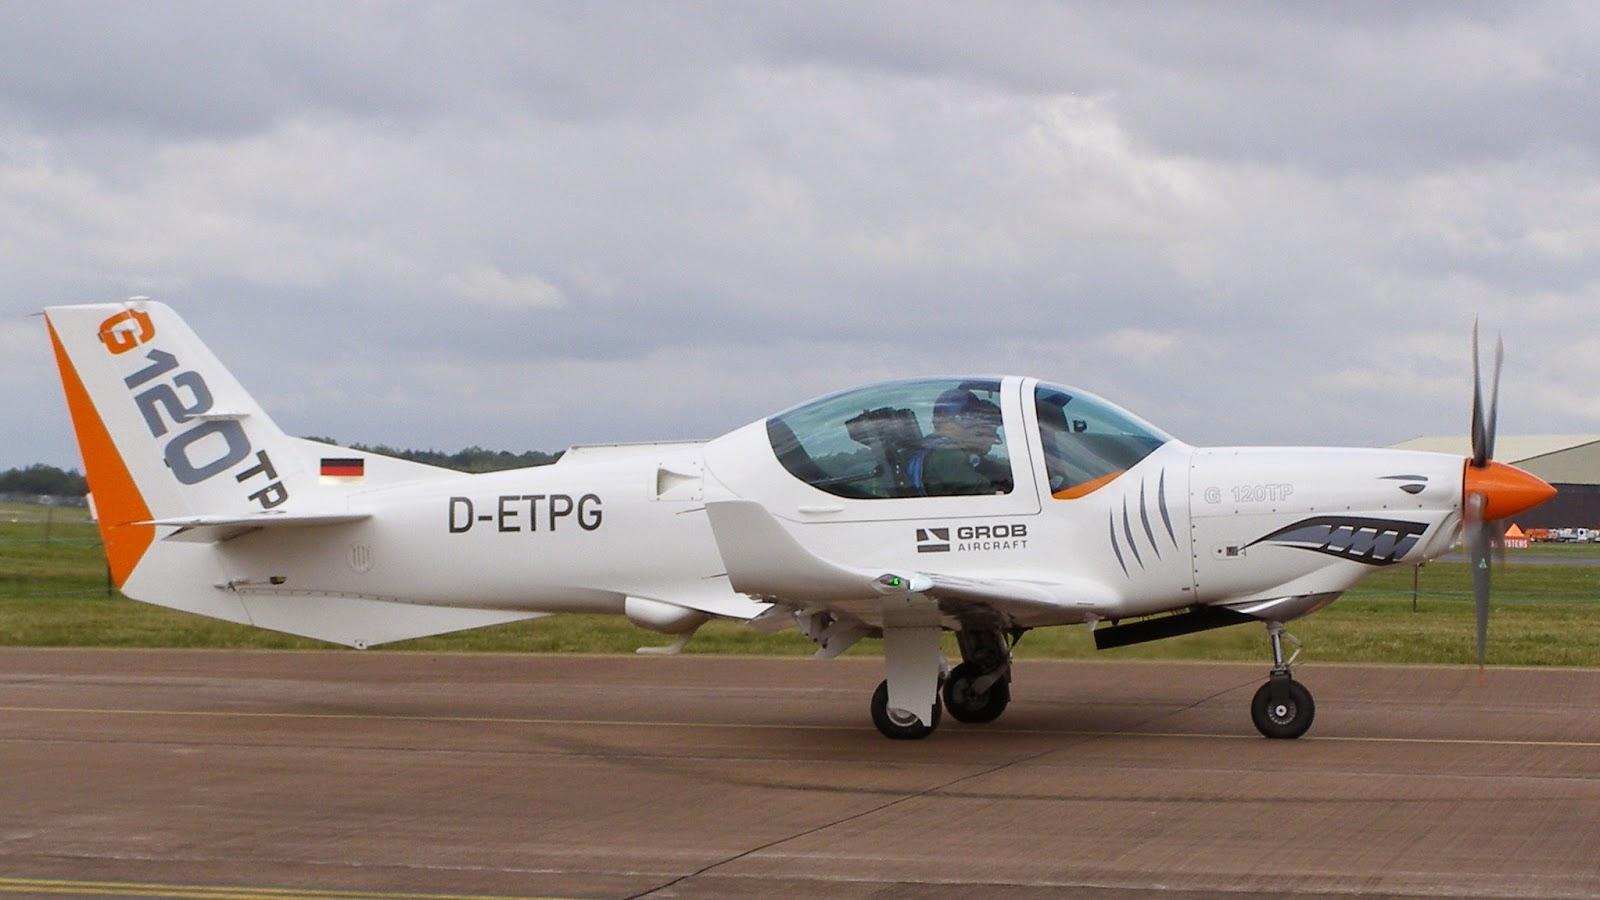 aeronaves - La Fuerza Aérea Mexicana compra 25 aeronaves turbohélice Grob G120TP. - Página 5 Grob120-D-ETPG